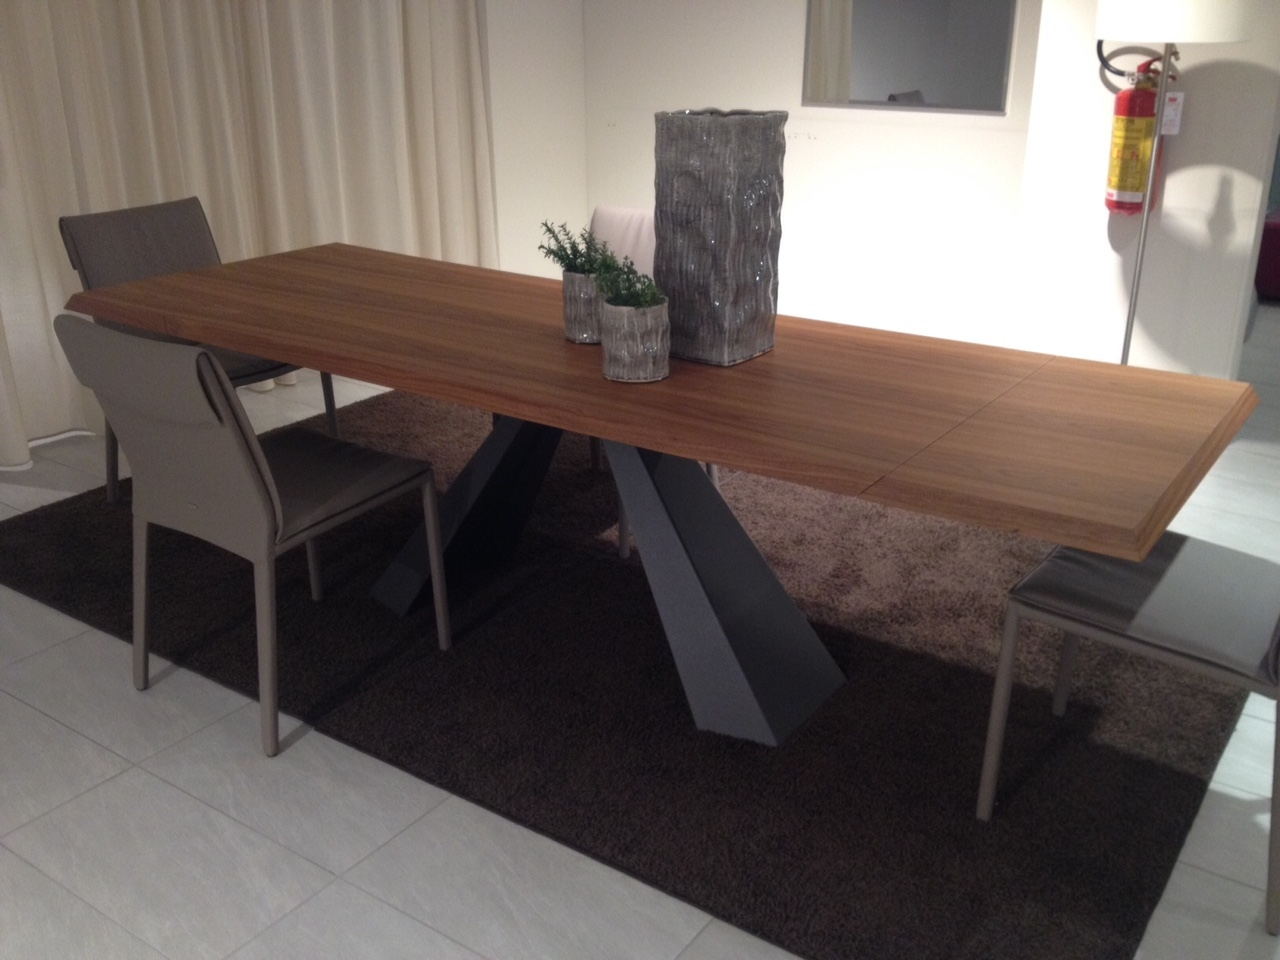 Tavolo cattelan eliot wood drive rettangolari allungabili for Tavoli rettangolari allungabili in legno